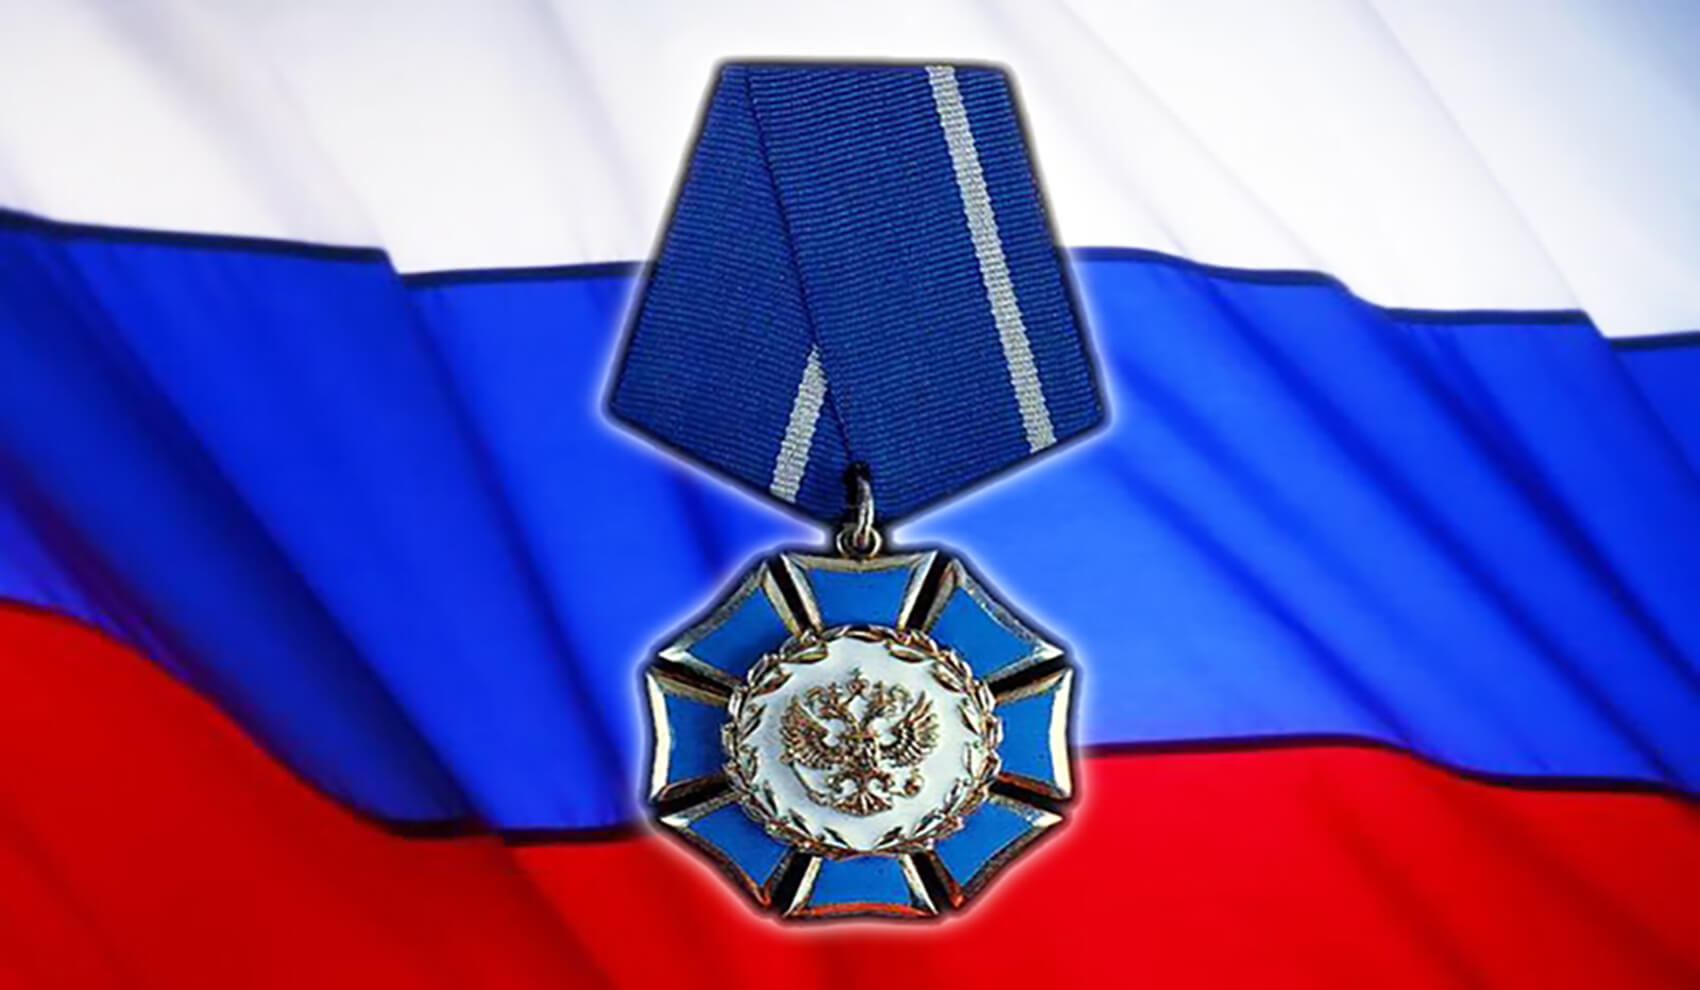 ордена россии фото